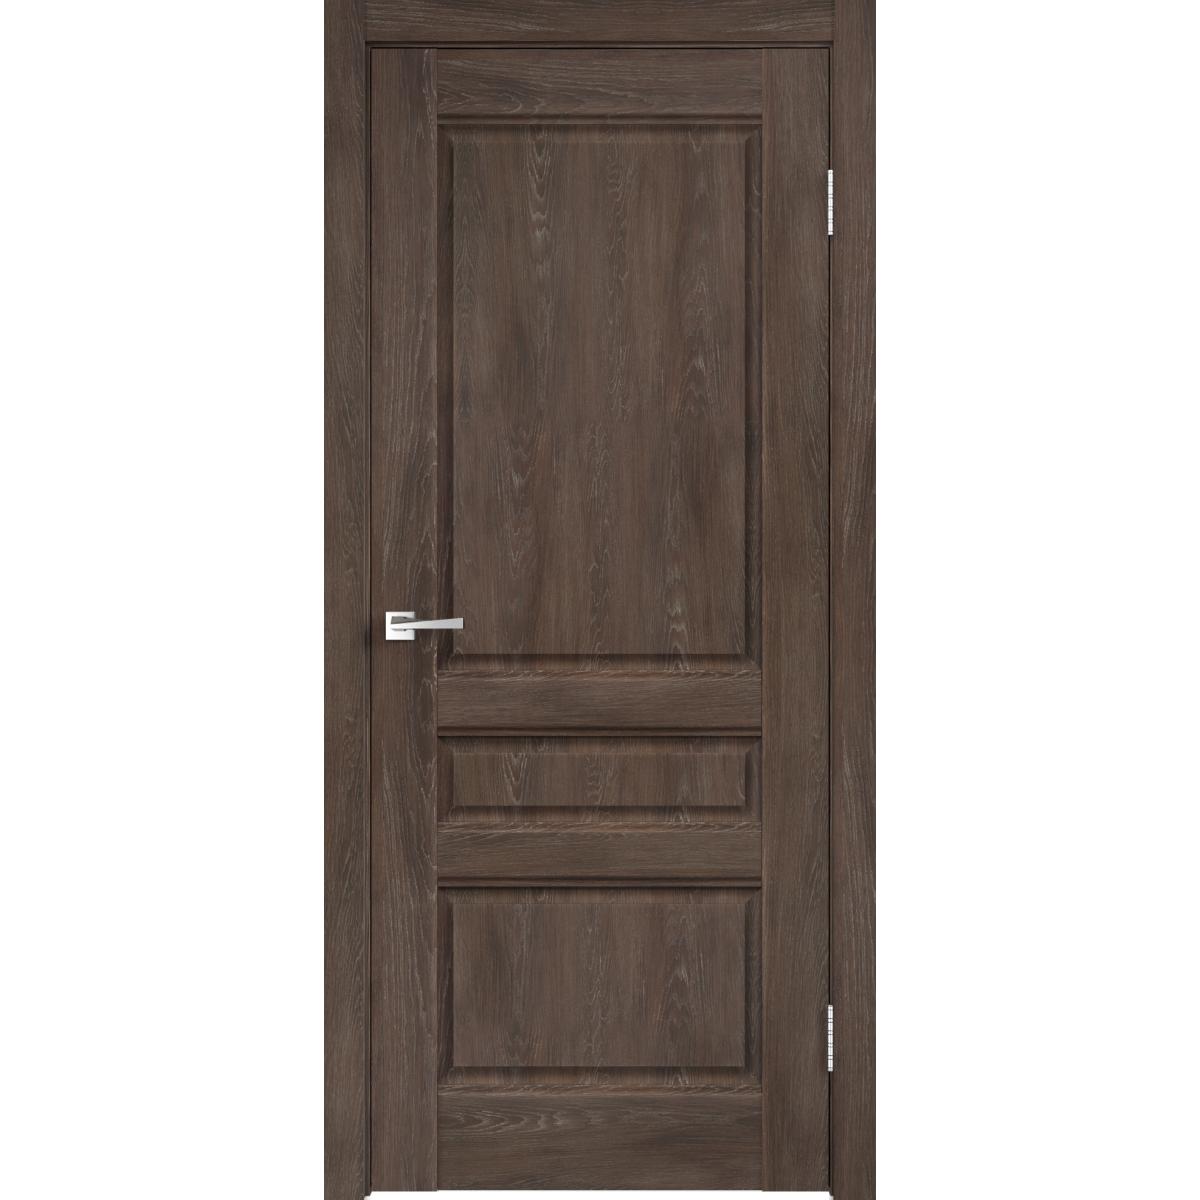 Дверь межкомнатная глухая «Летиция» 60x200 см ПВХ цвет дуб корица с фурнитурой